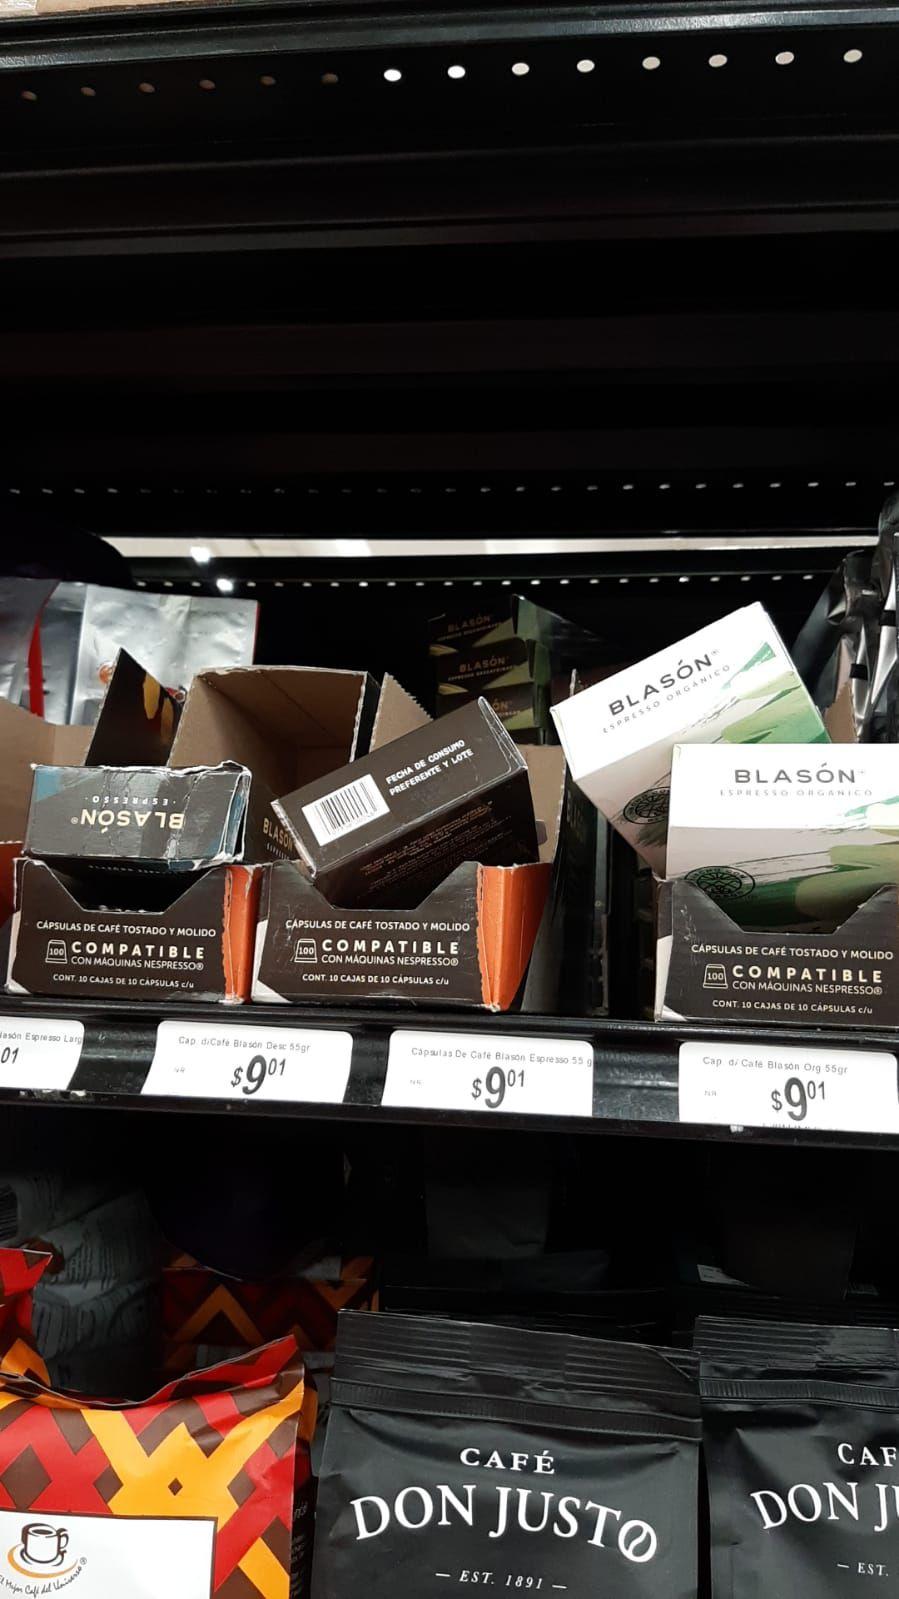 Chedraui: Café blasón para nesspreso